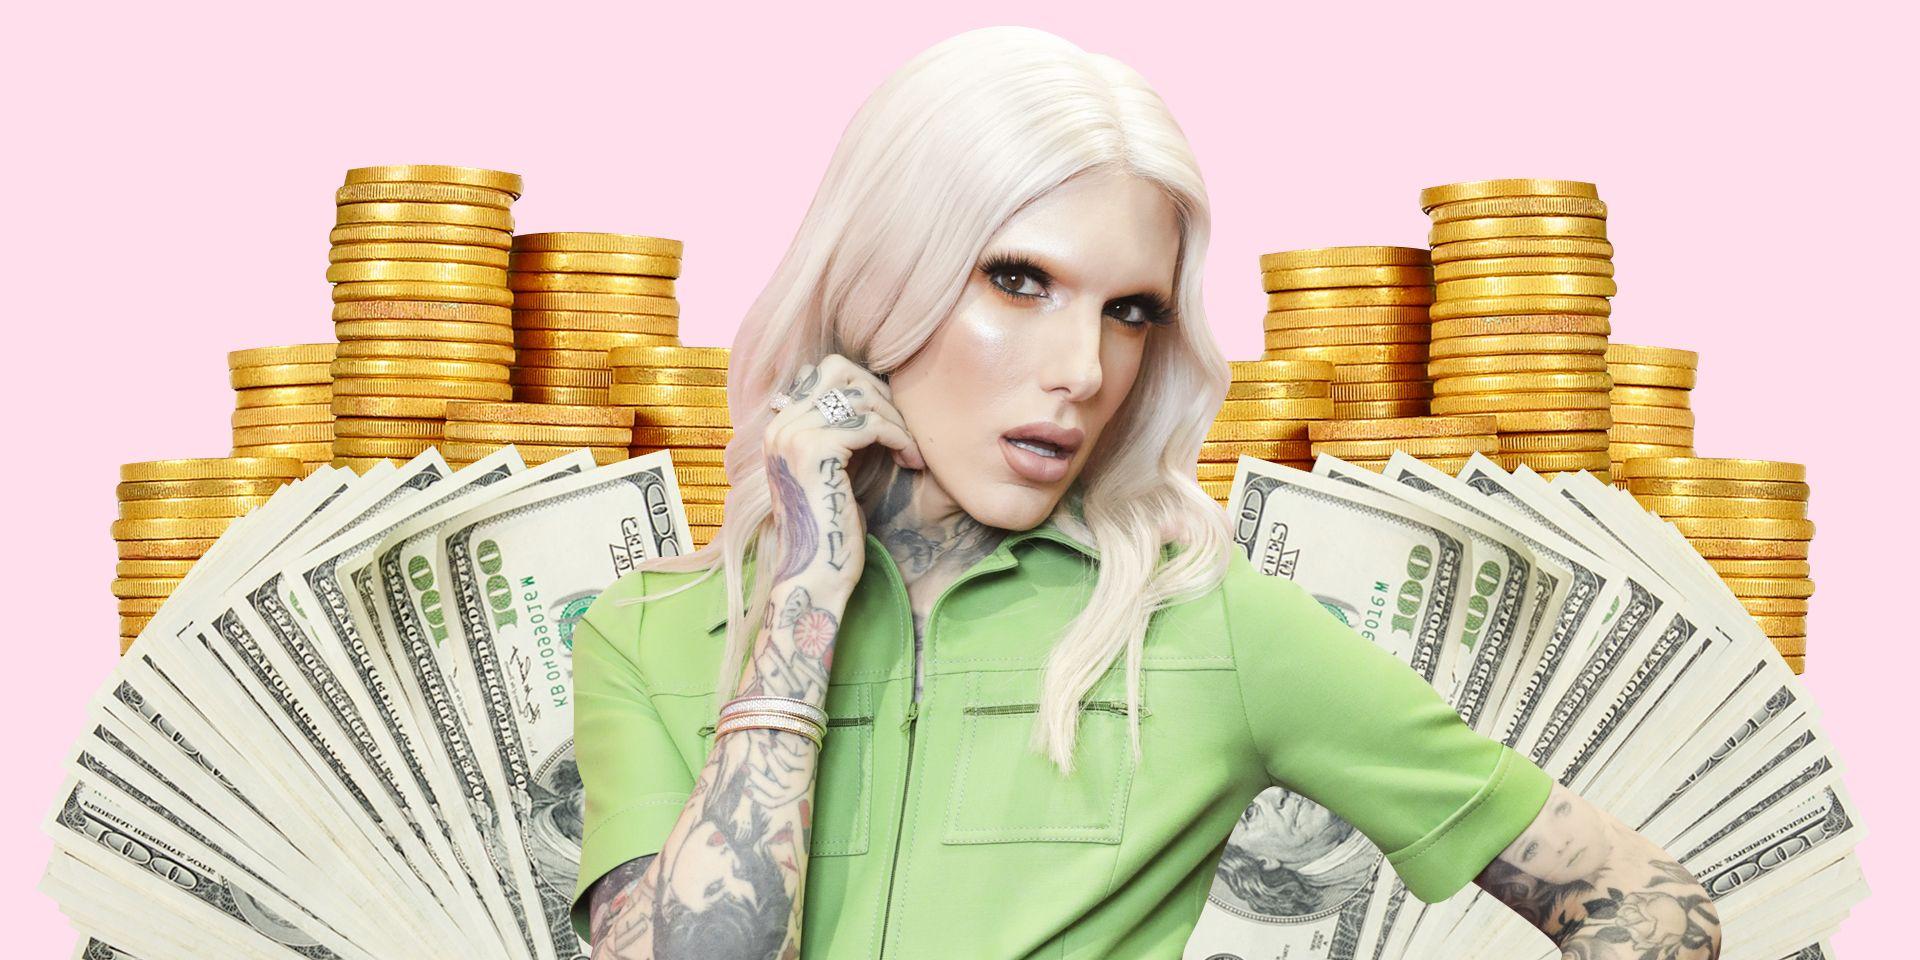 Jeffree Star Net Worth 2020 – How Much Does Jeffree Star Make?